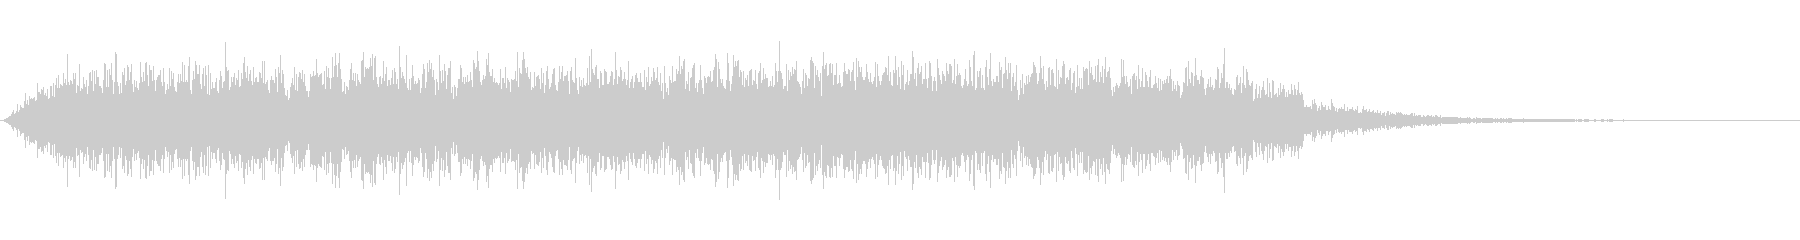 latigo 7をシューッという音の未再生の波形